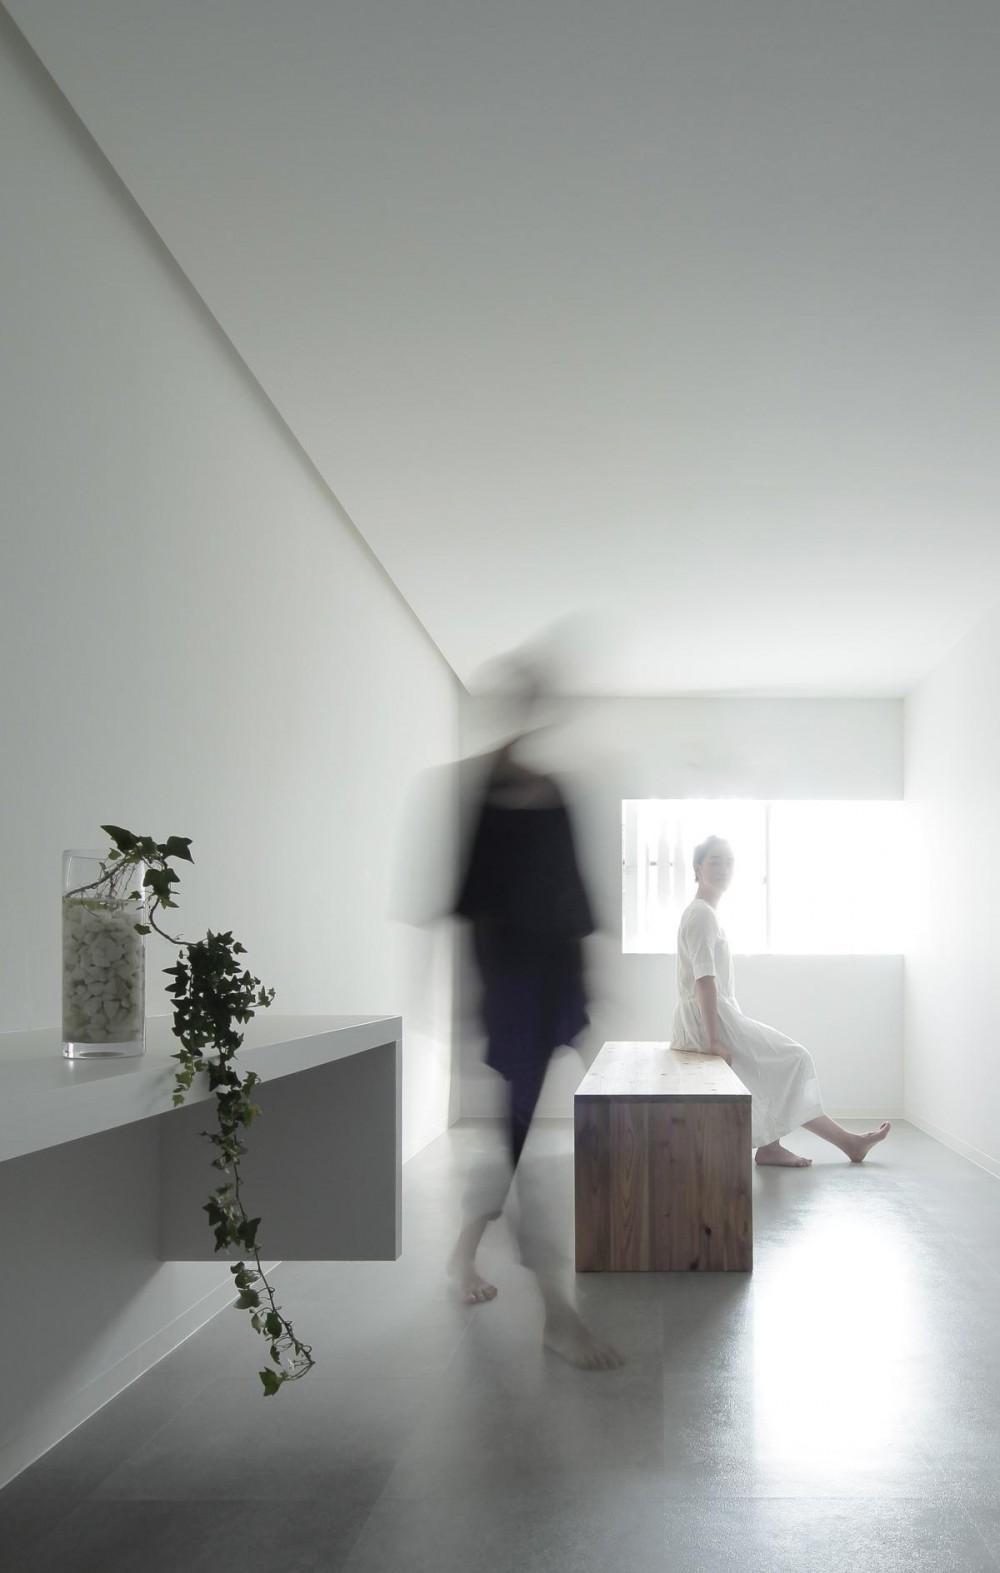 N Housing - 集合住宅リノベーション (room02)